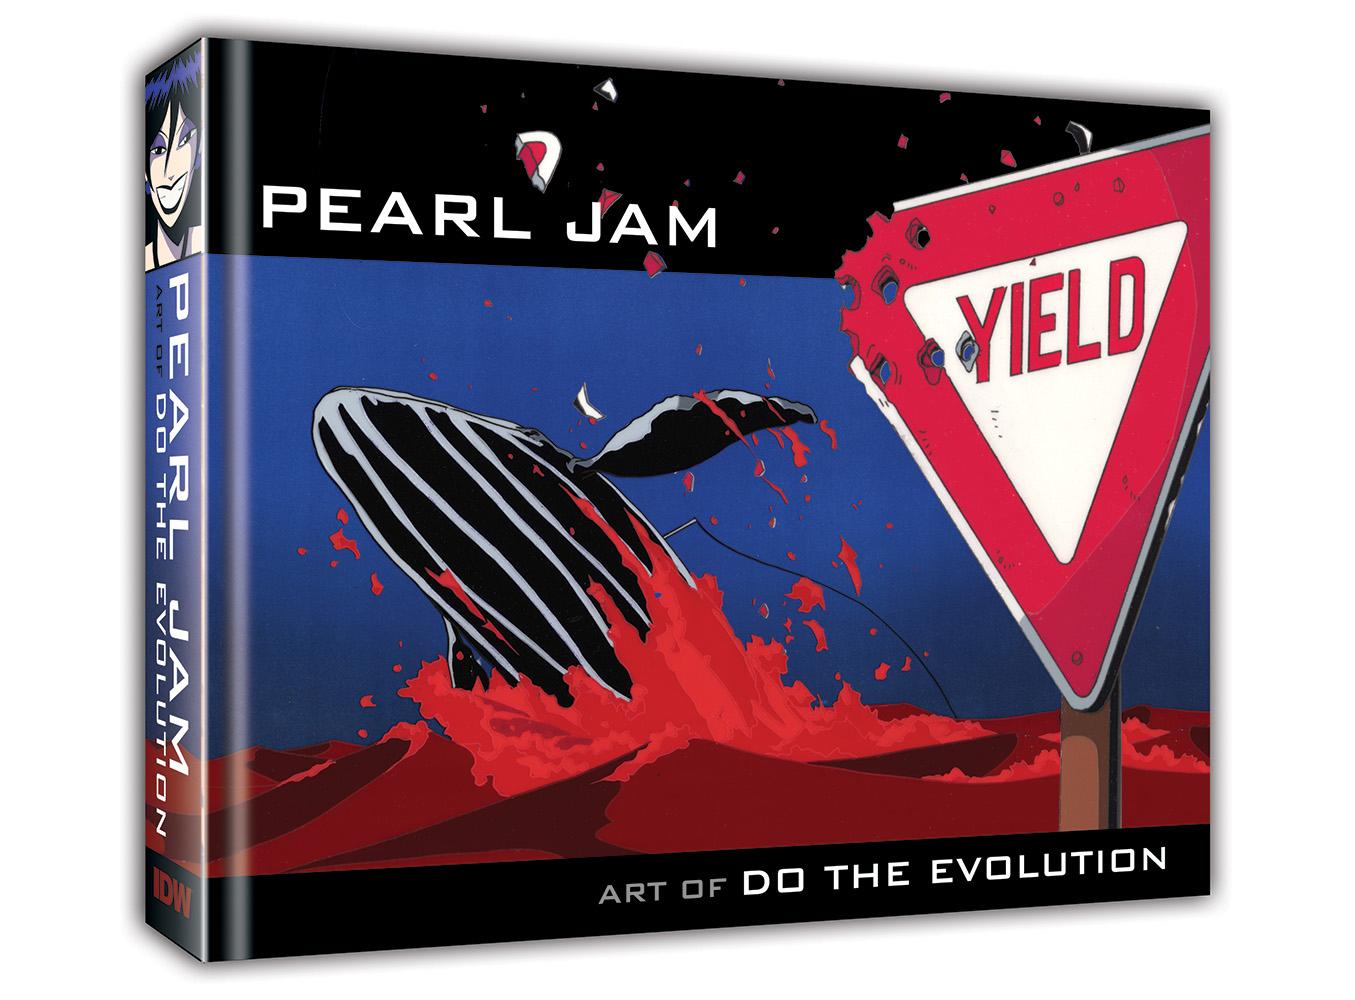 PEARL JAM ART OF DO THE EVOLUTION HC (RES)